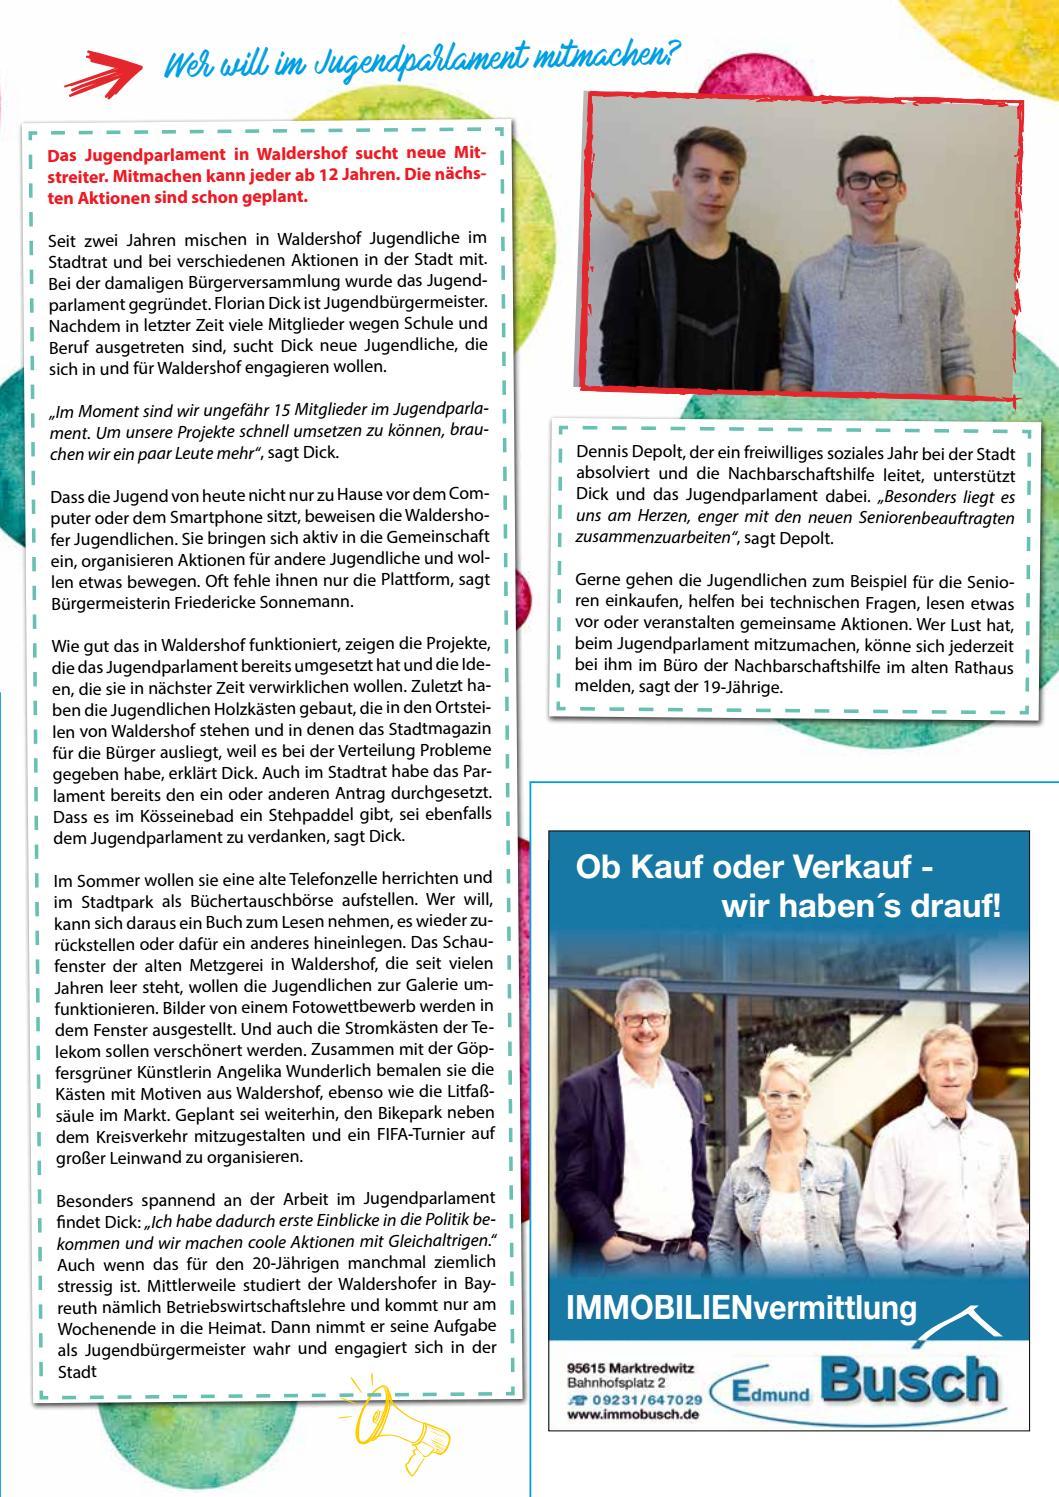 Waldershof Aktuell Ausgabe 1 - 2018 by Waldershof Aktuell - issuu